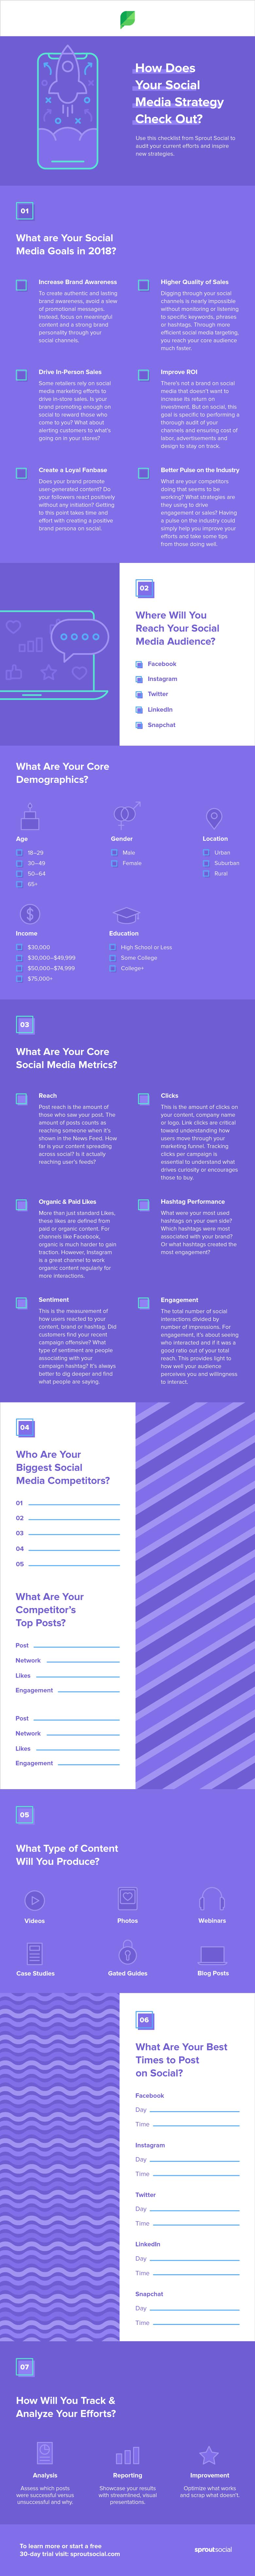 Social Media Marketing Strategy Checklist 2018 [Infographic